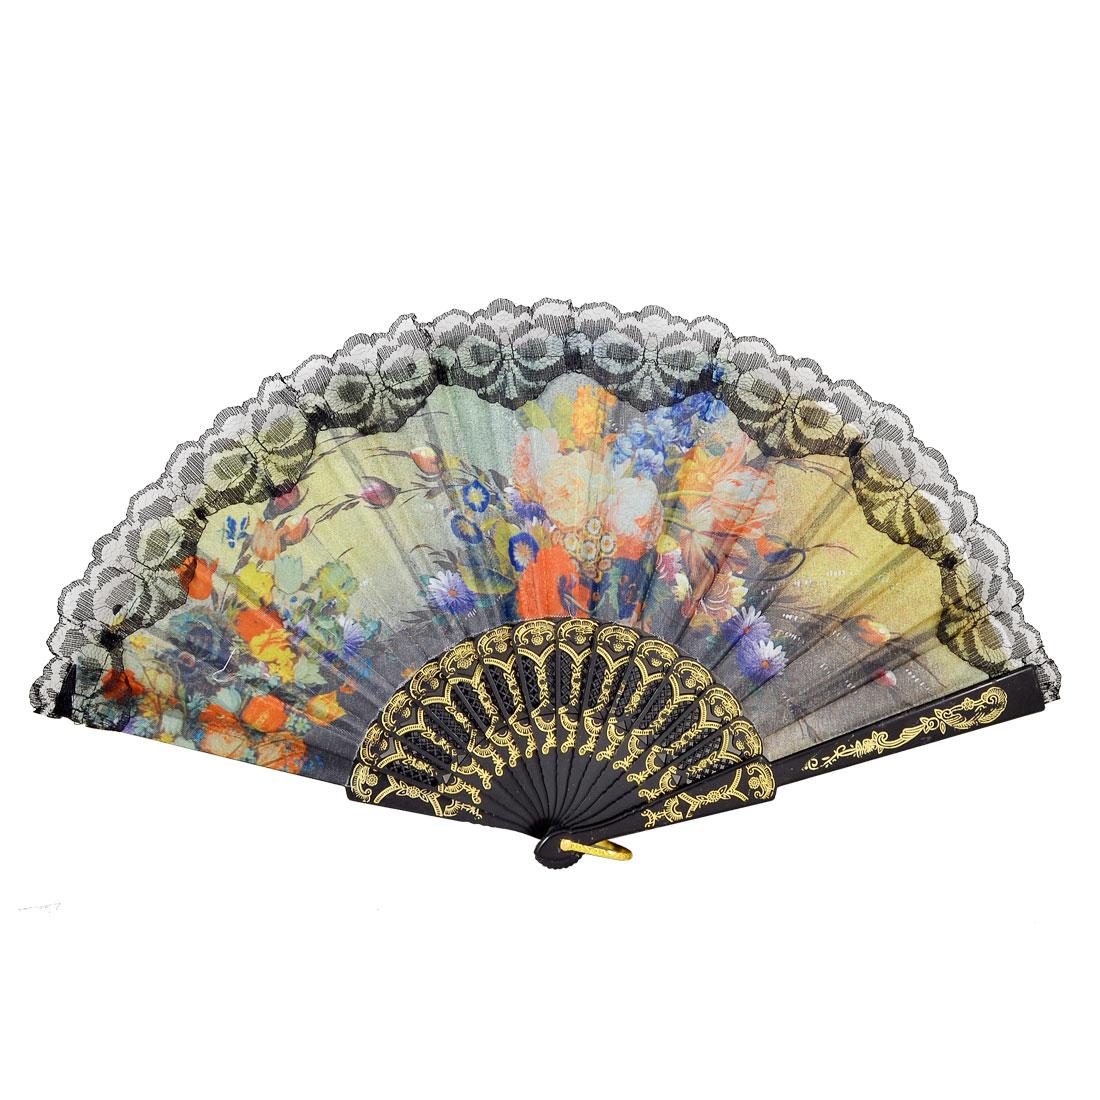 Black Lace Trim Assorted Color Flower Bud Floral Prints Organza Folding Hand Fan